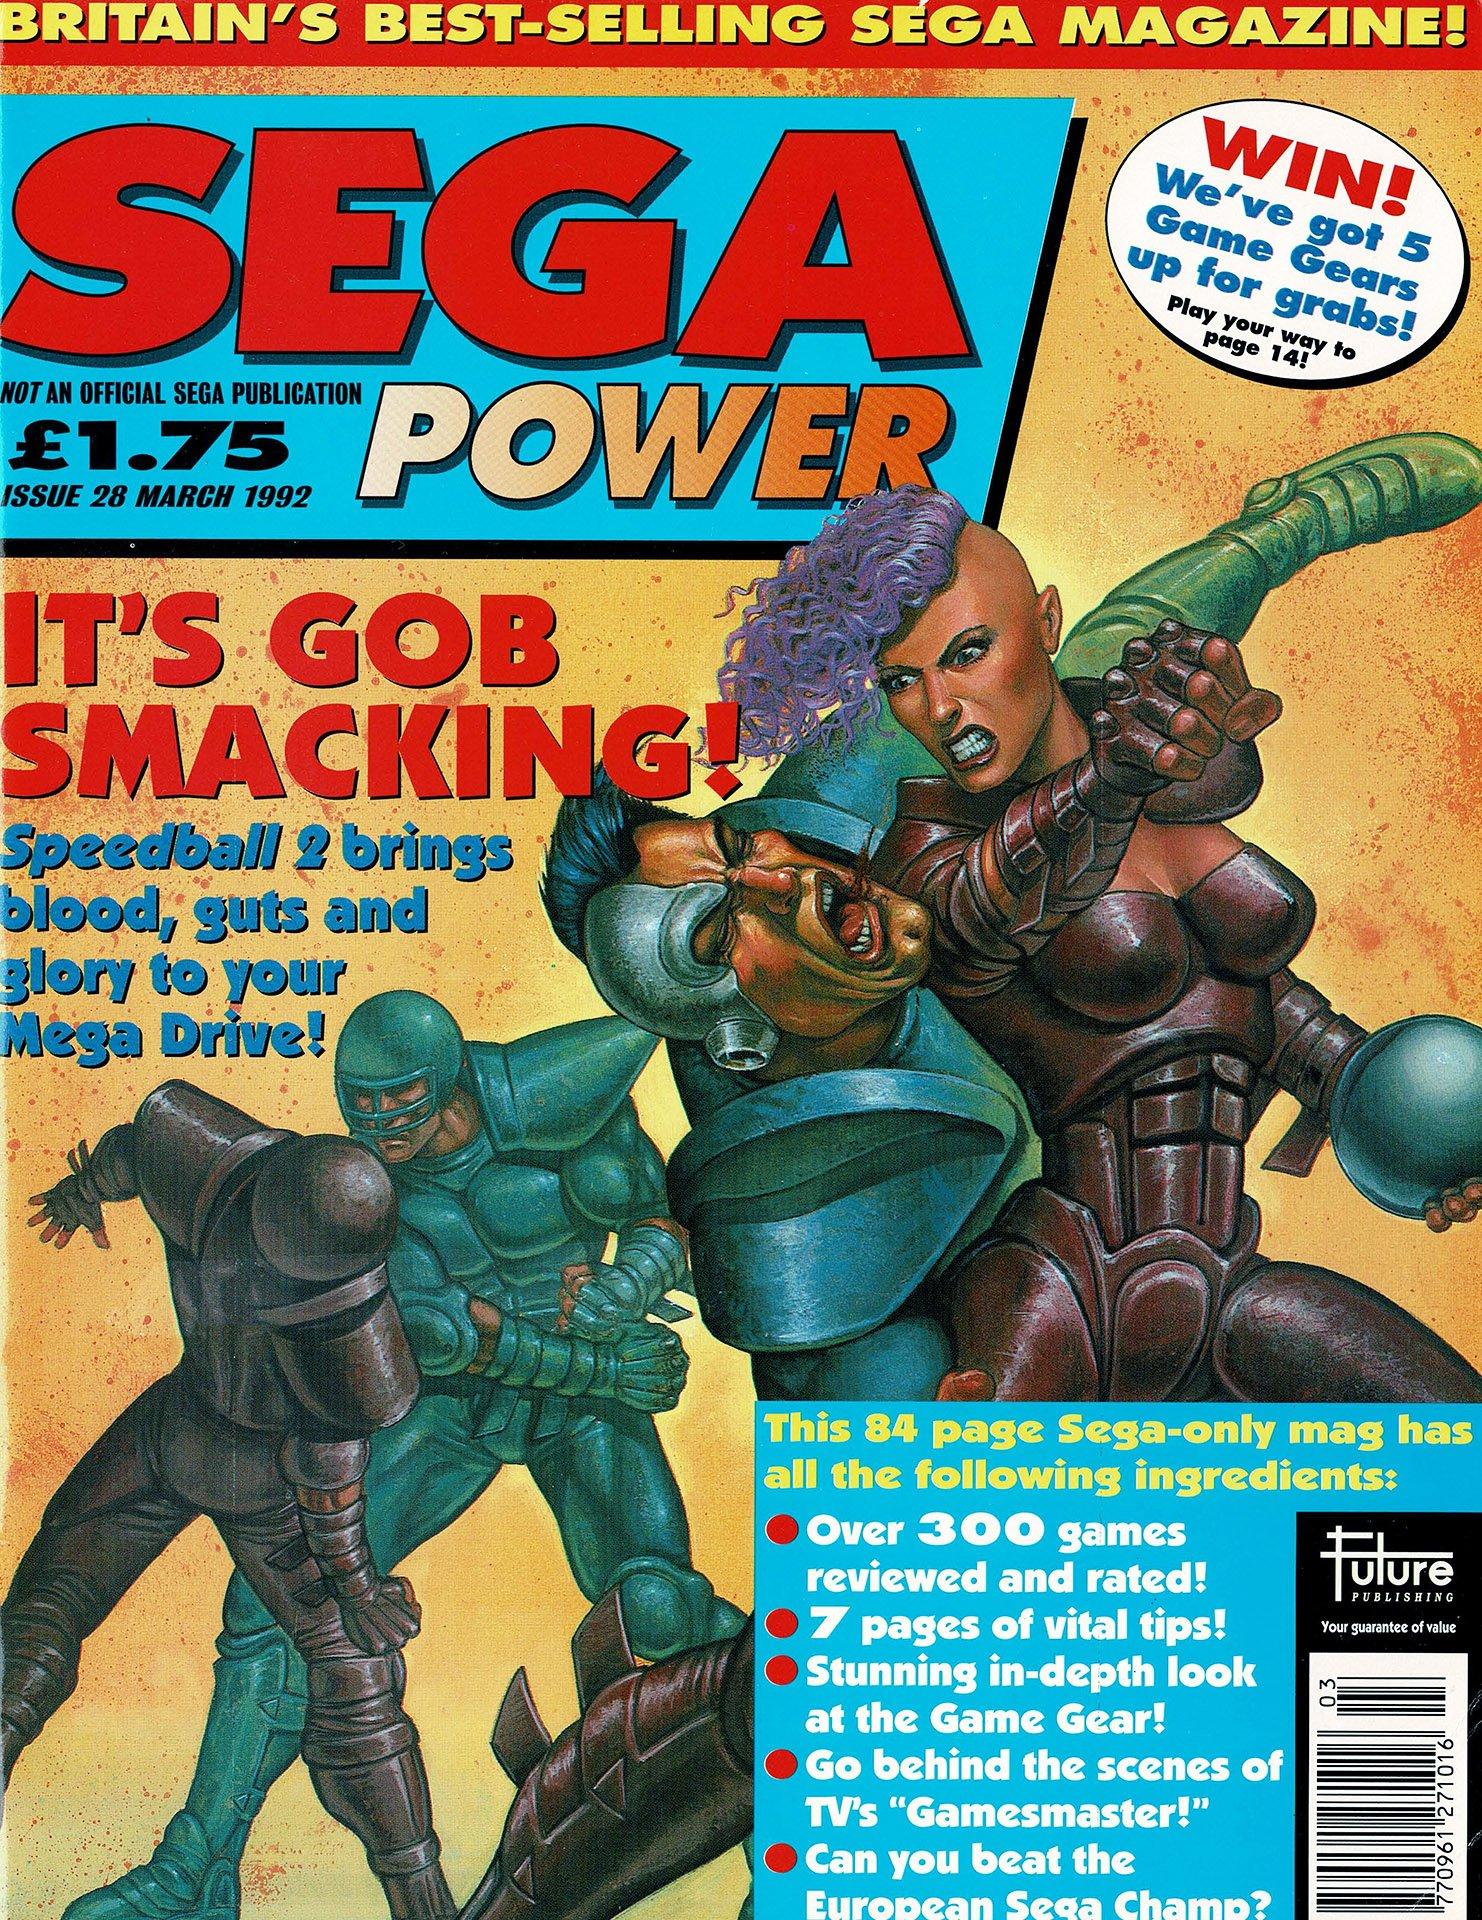 Sega Power Issue 28 (March 1992)